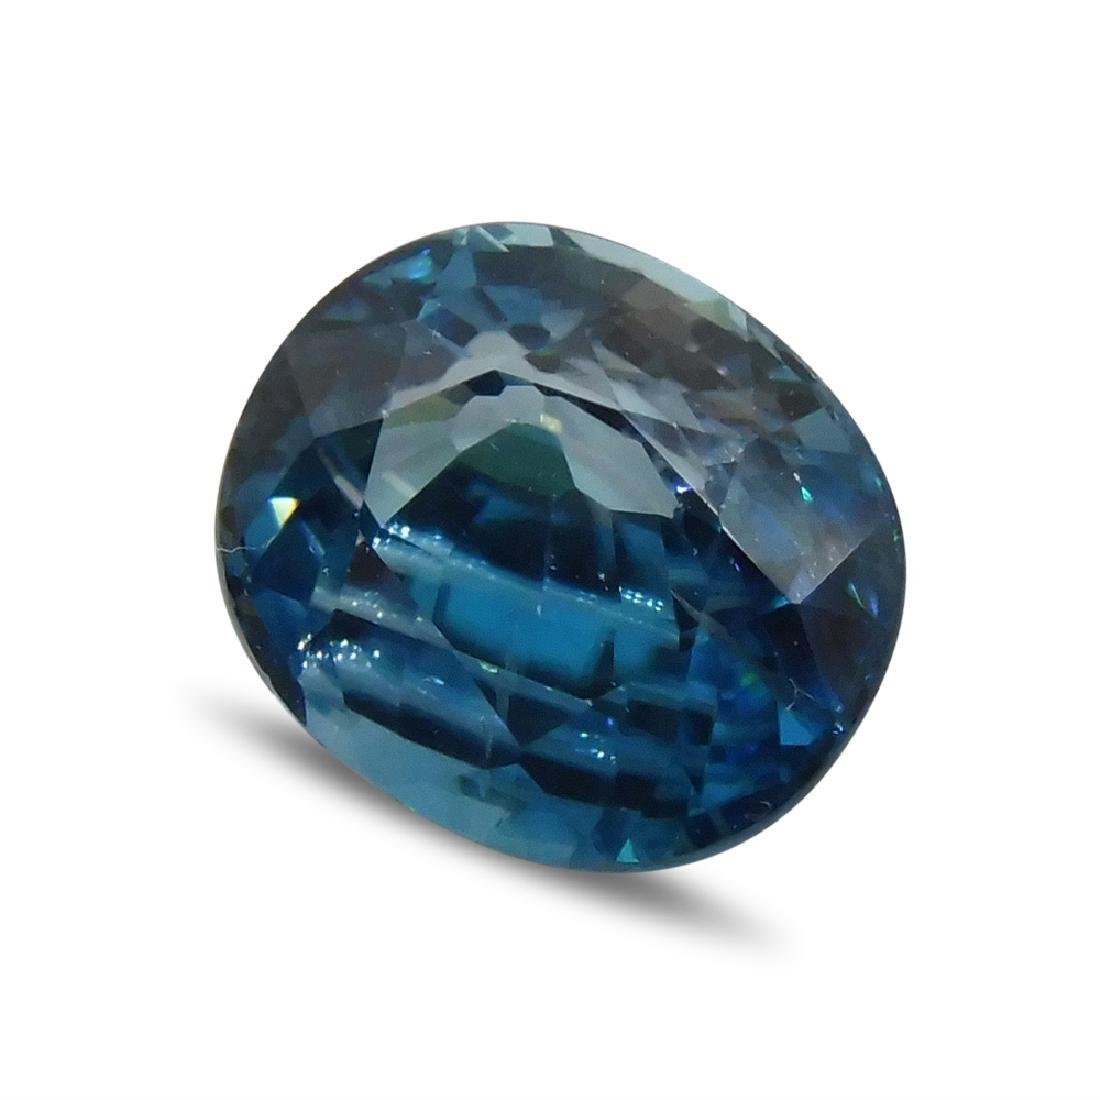 4.39 ct Oval Blue Zircon